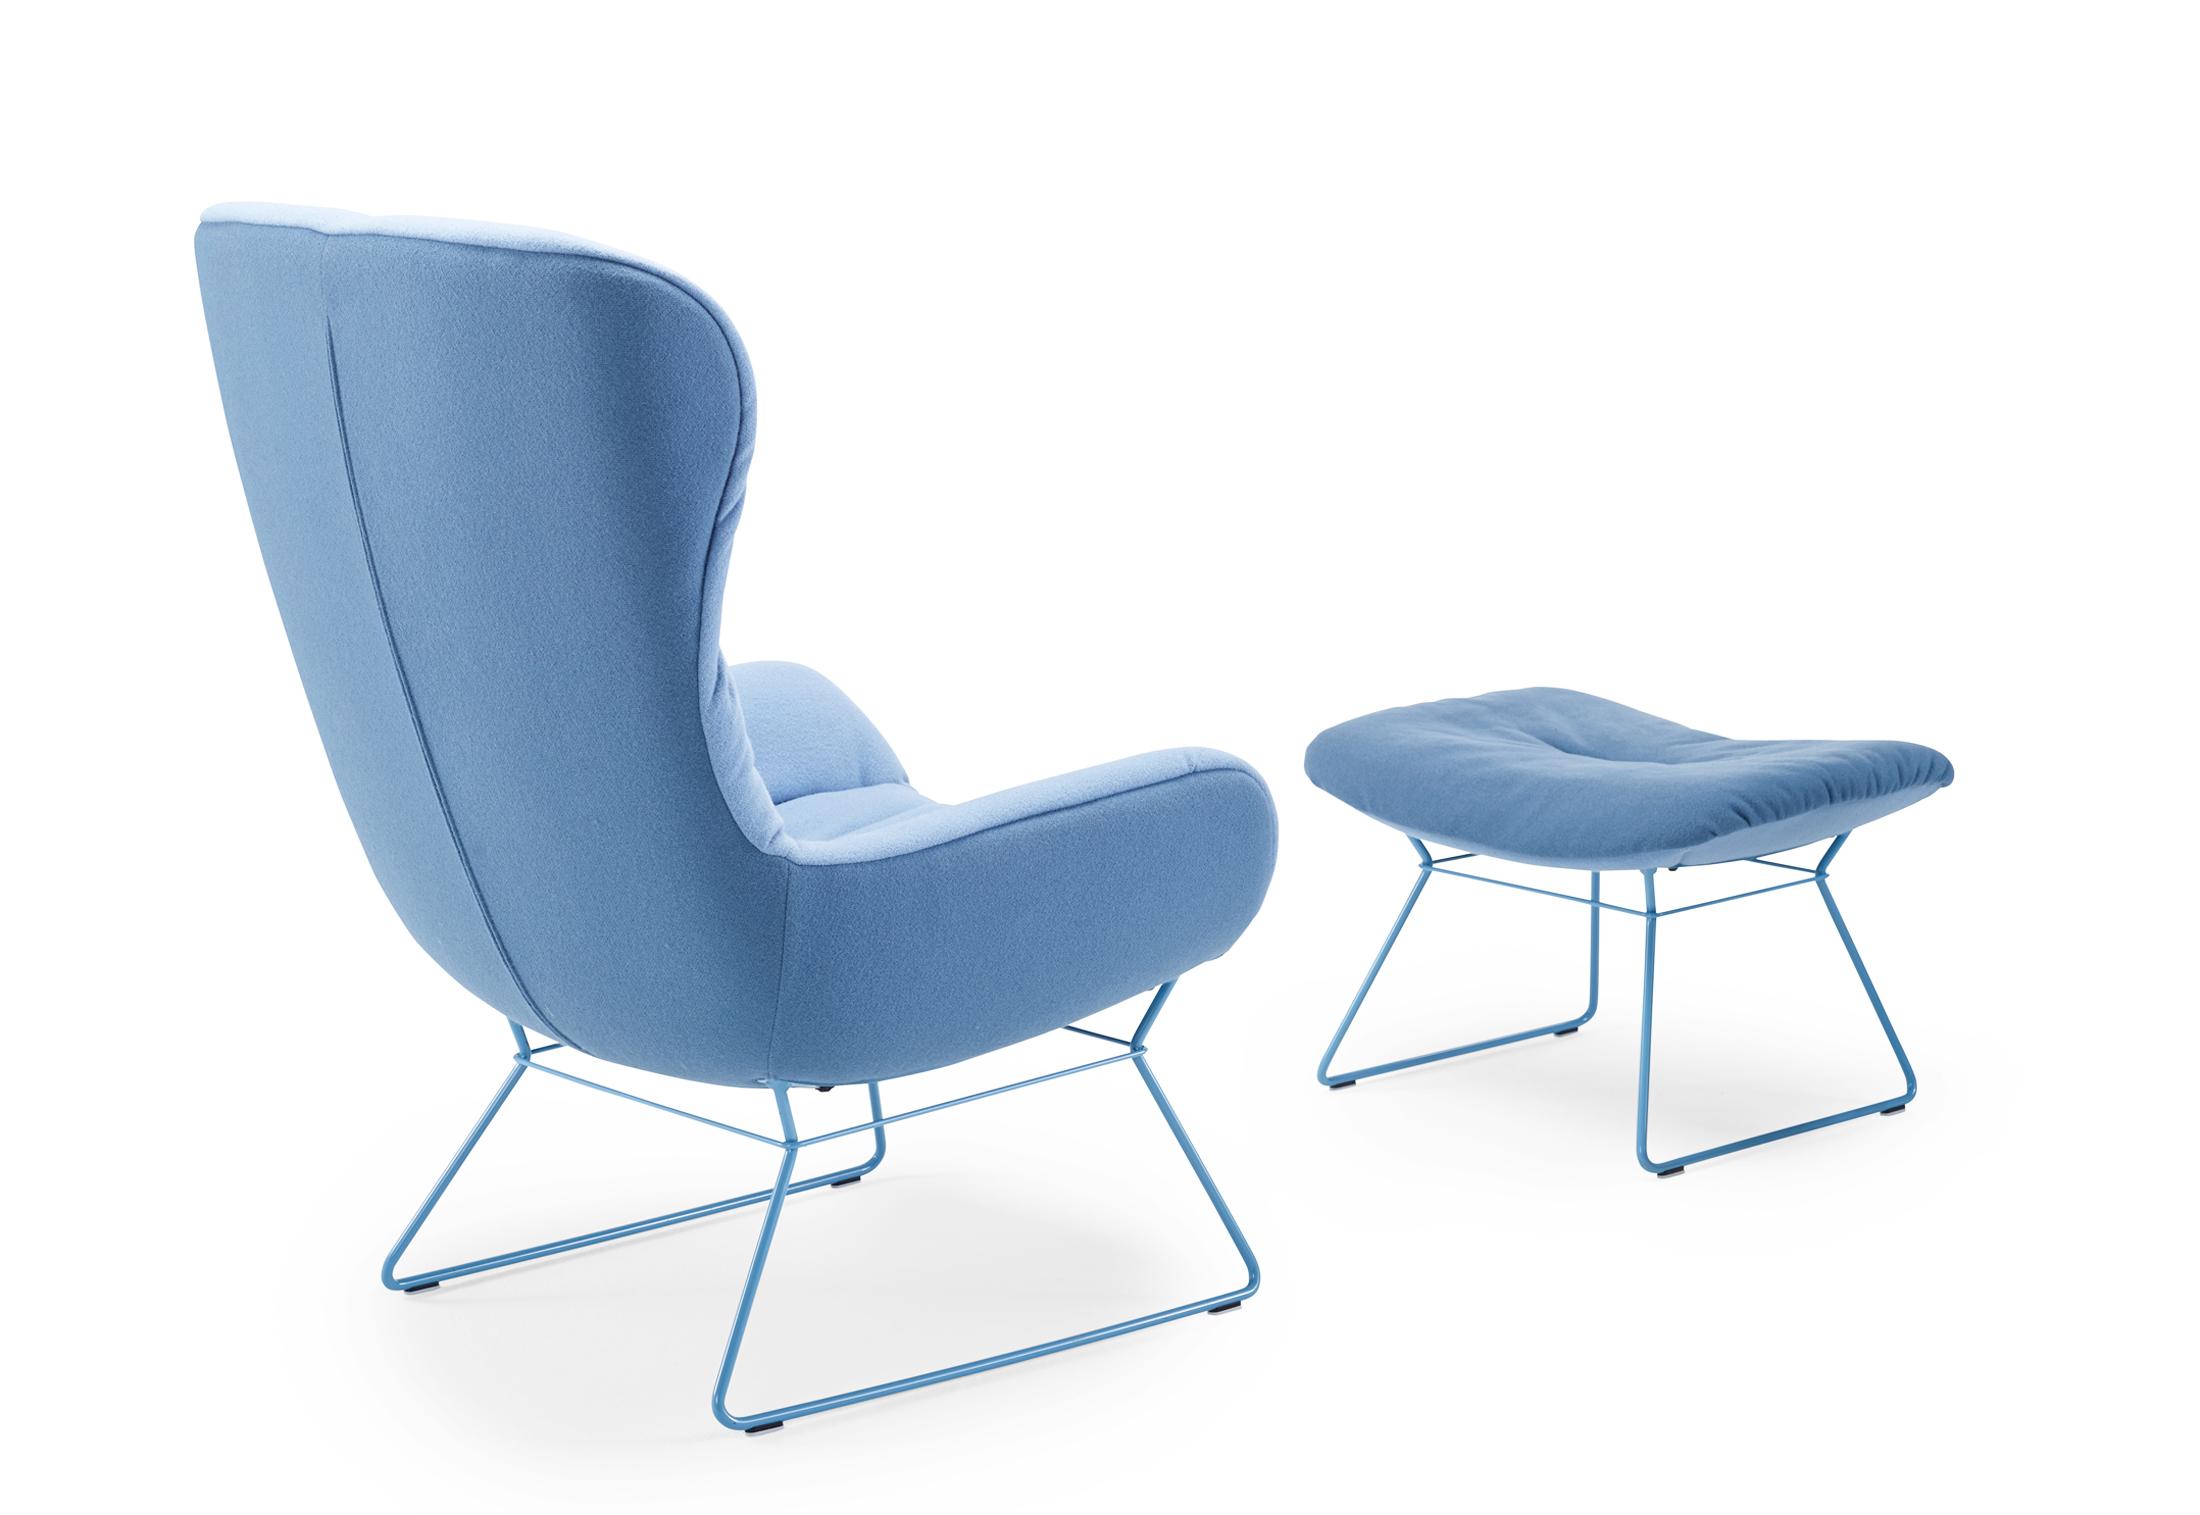 Leya wingback chair with wire frame by Freifrau | STYLEPARK